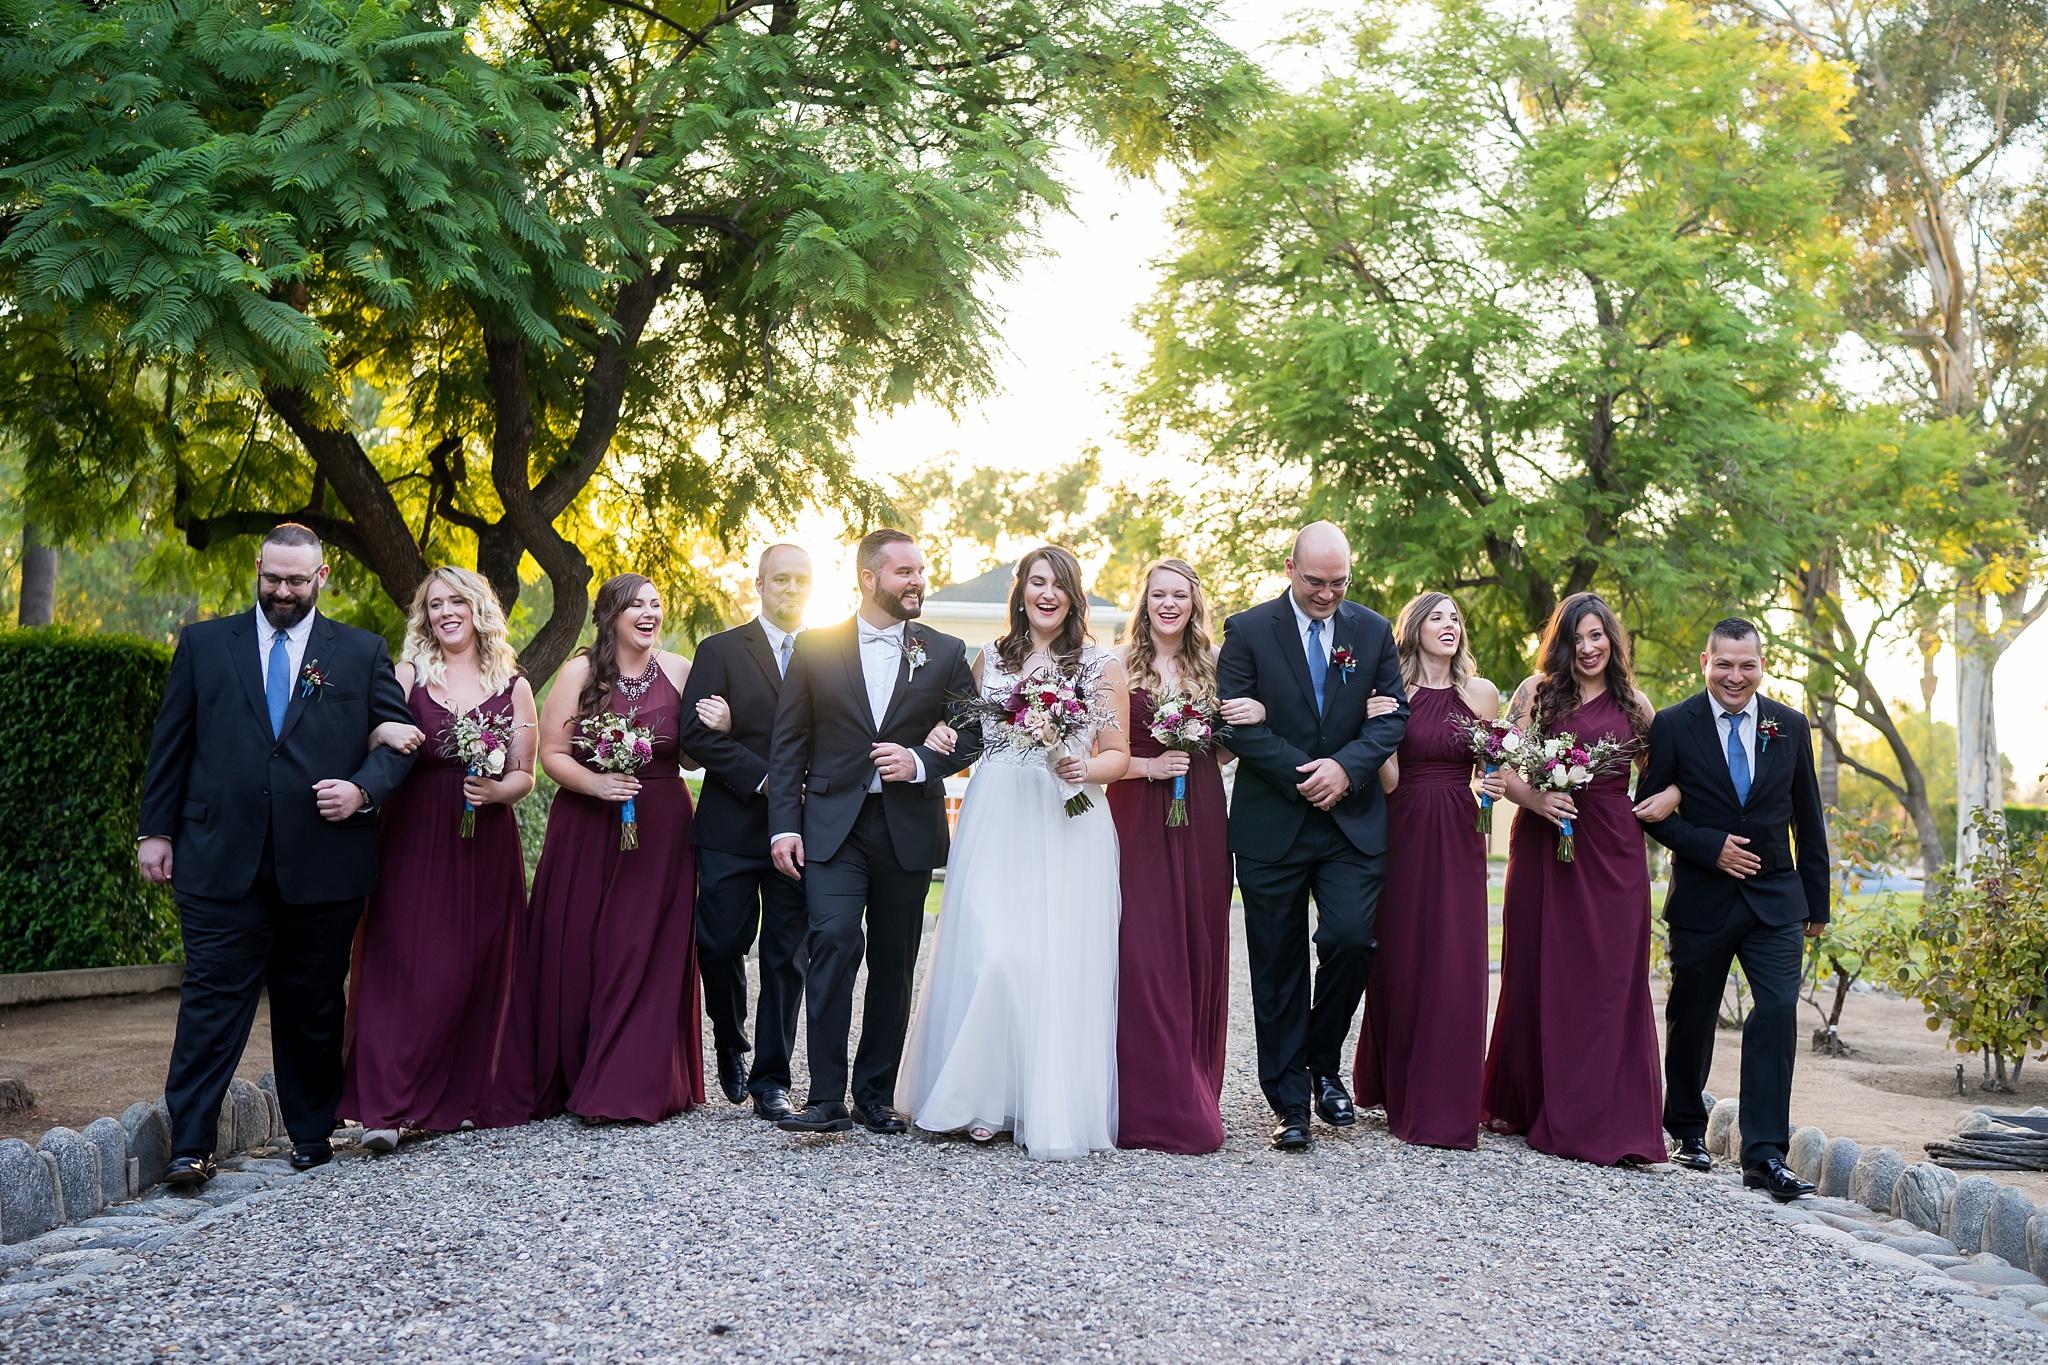 TommyandAmanda_WEDDING_BrienneMichelle_WeddingParty_12_BLOG.jpg